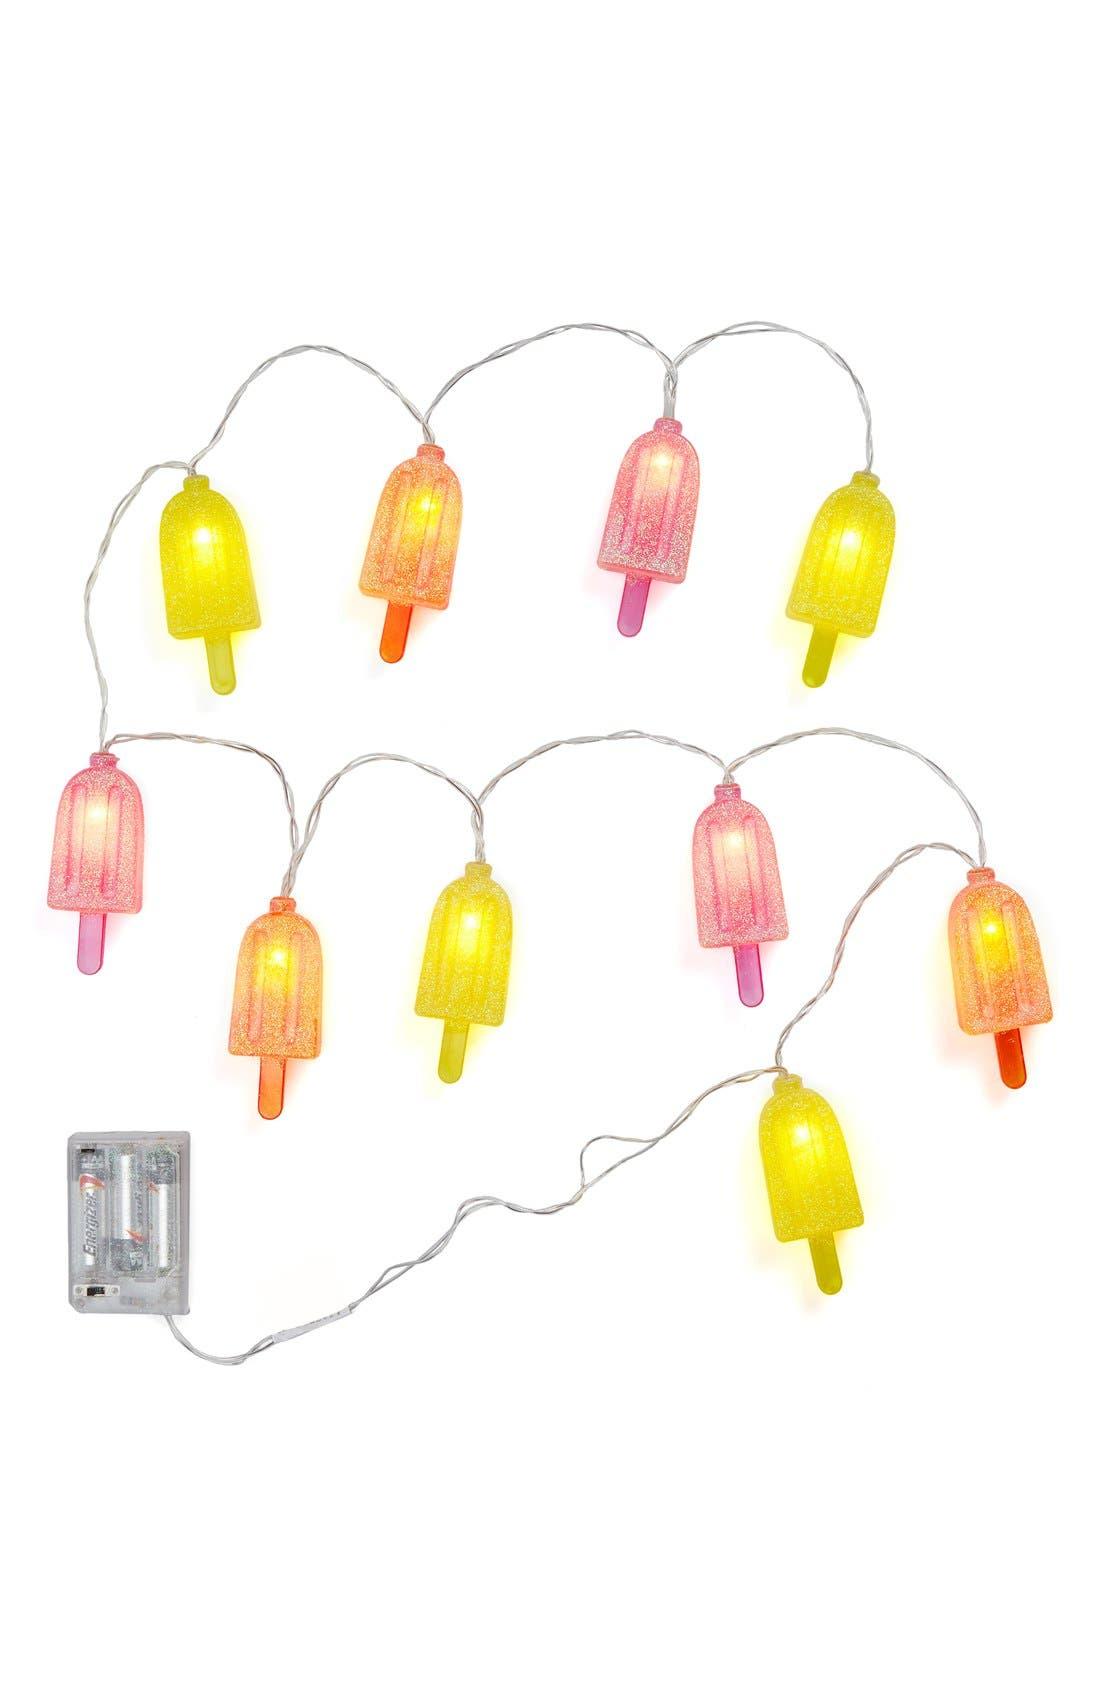 Alternate Image 1 Selected - Talking Tables 'Popsicle' Light String